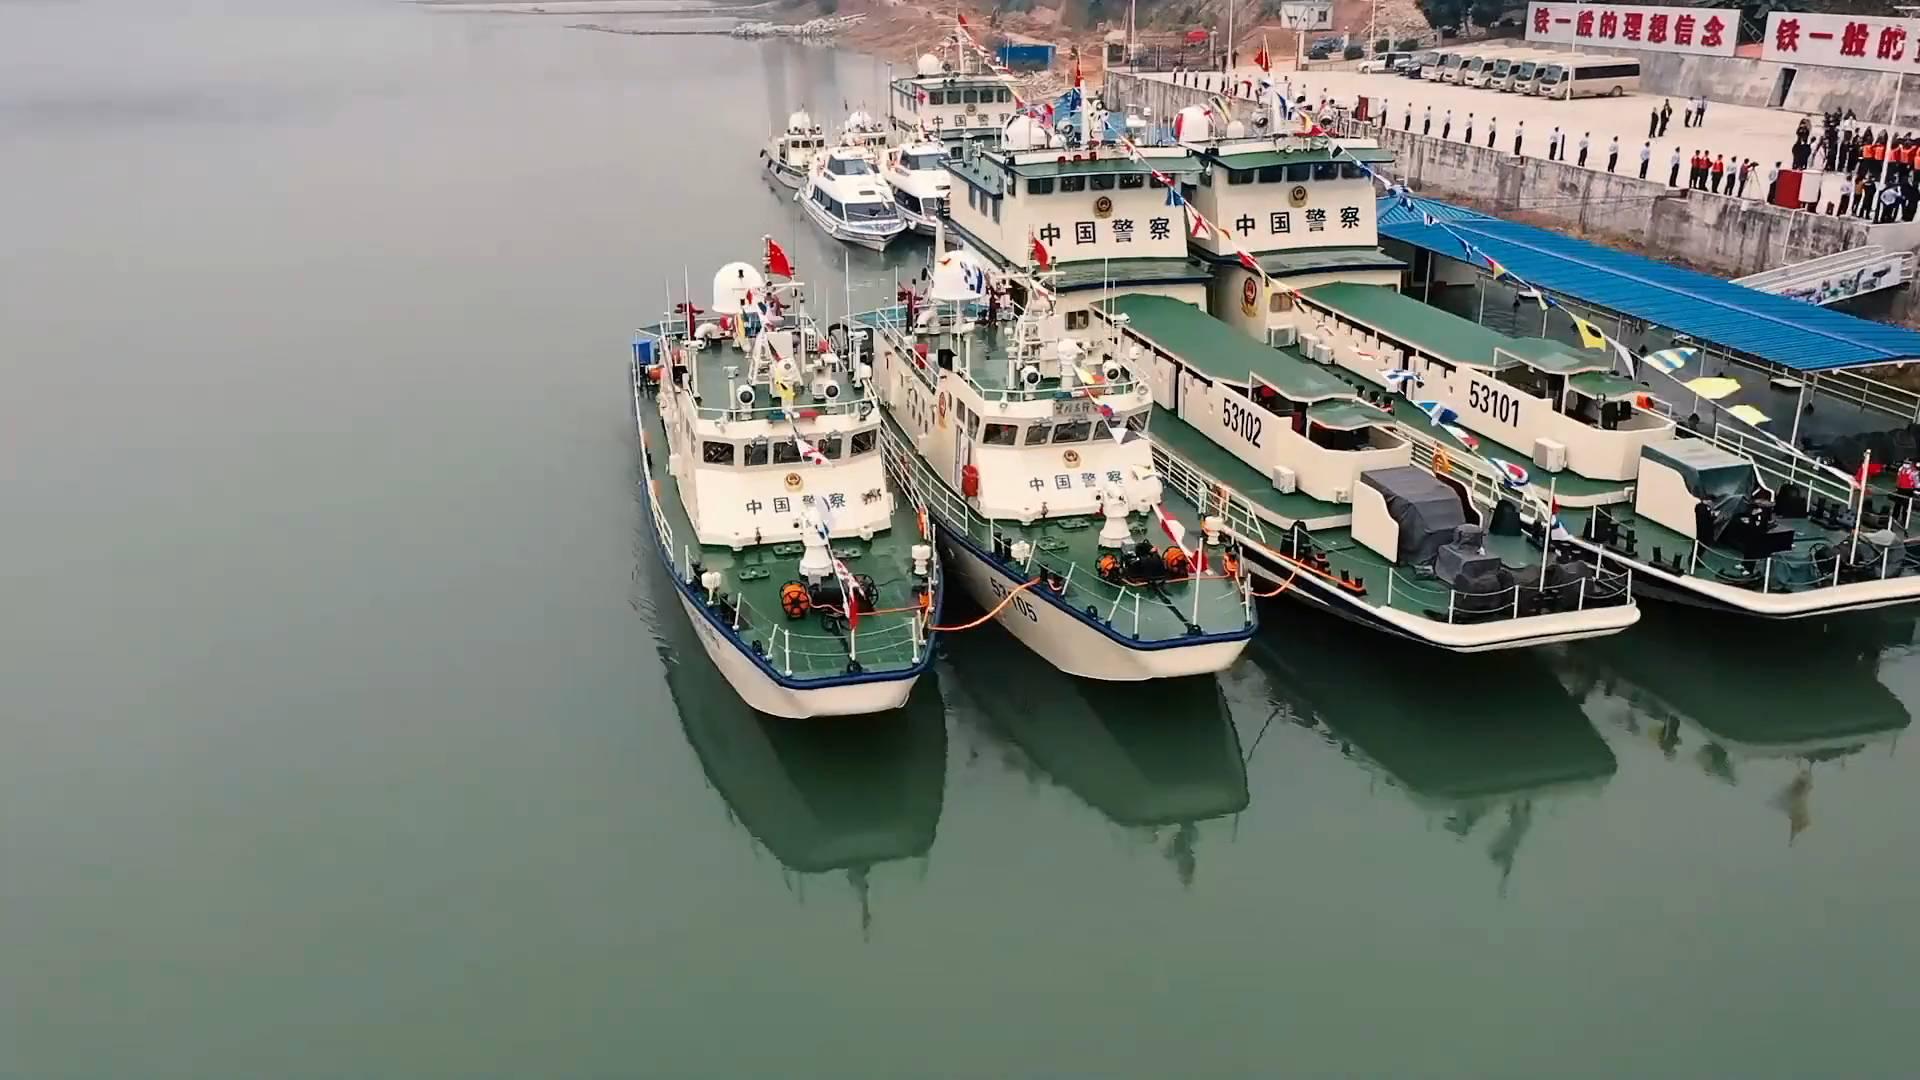 100th joint patrol on Mekong River begins